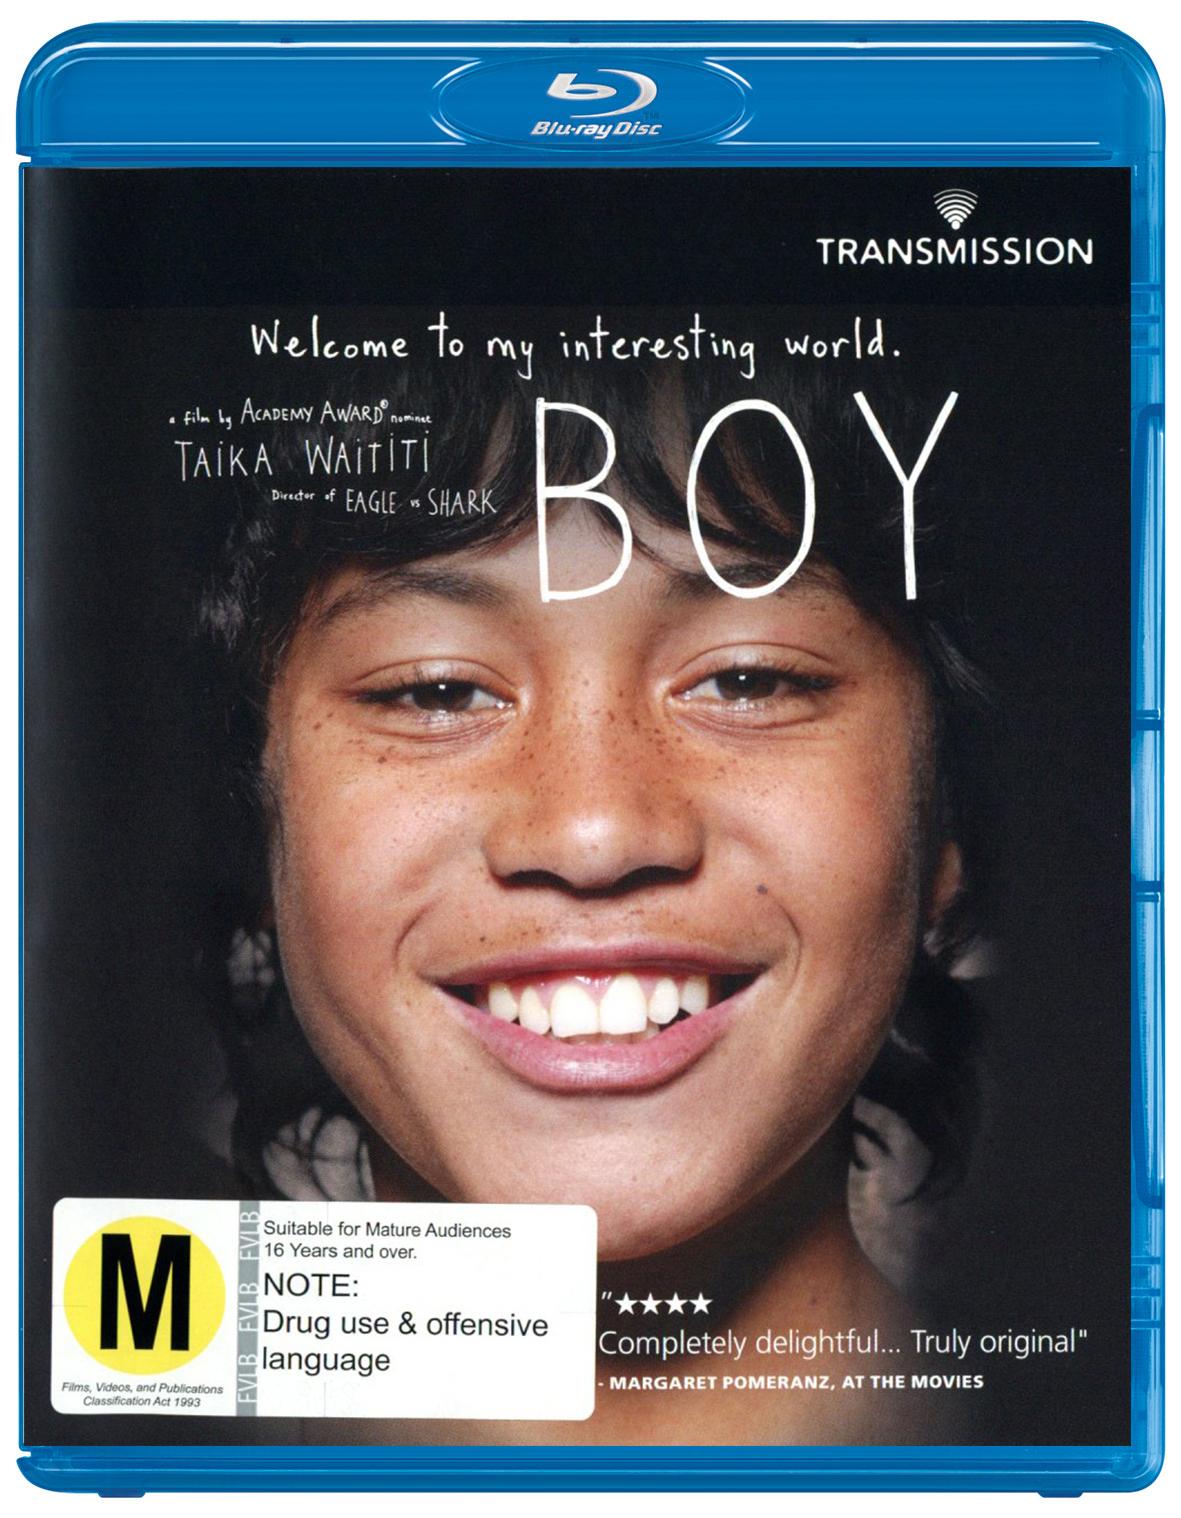 Boy on Blu-ray image